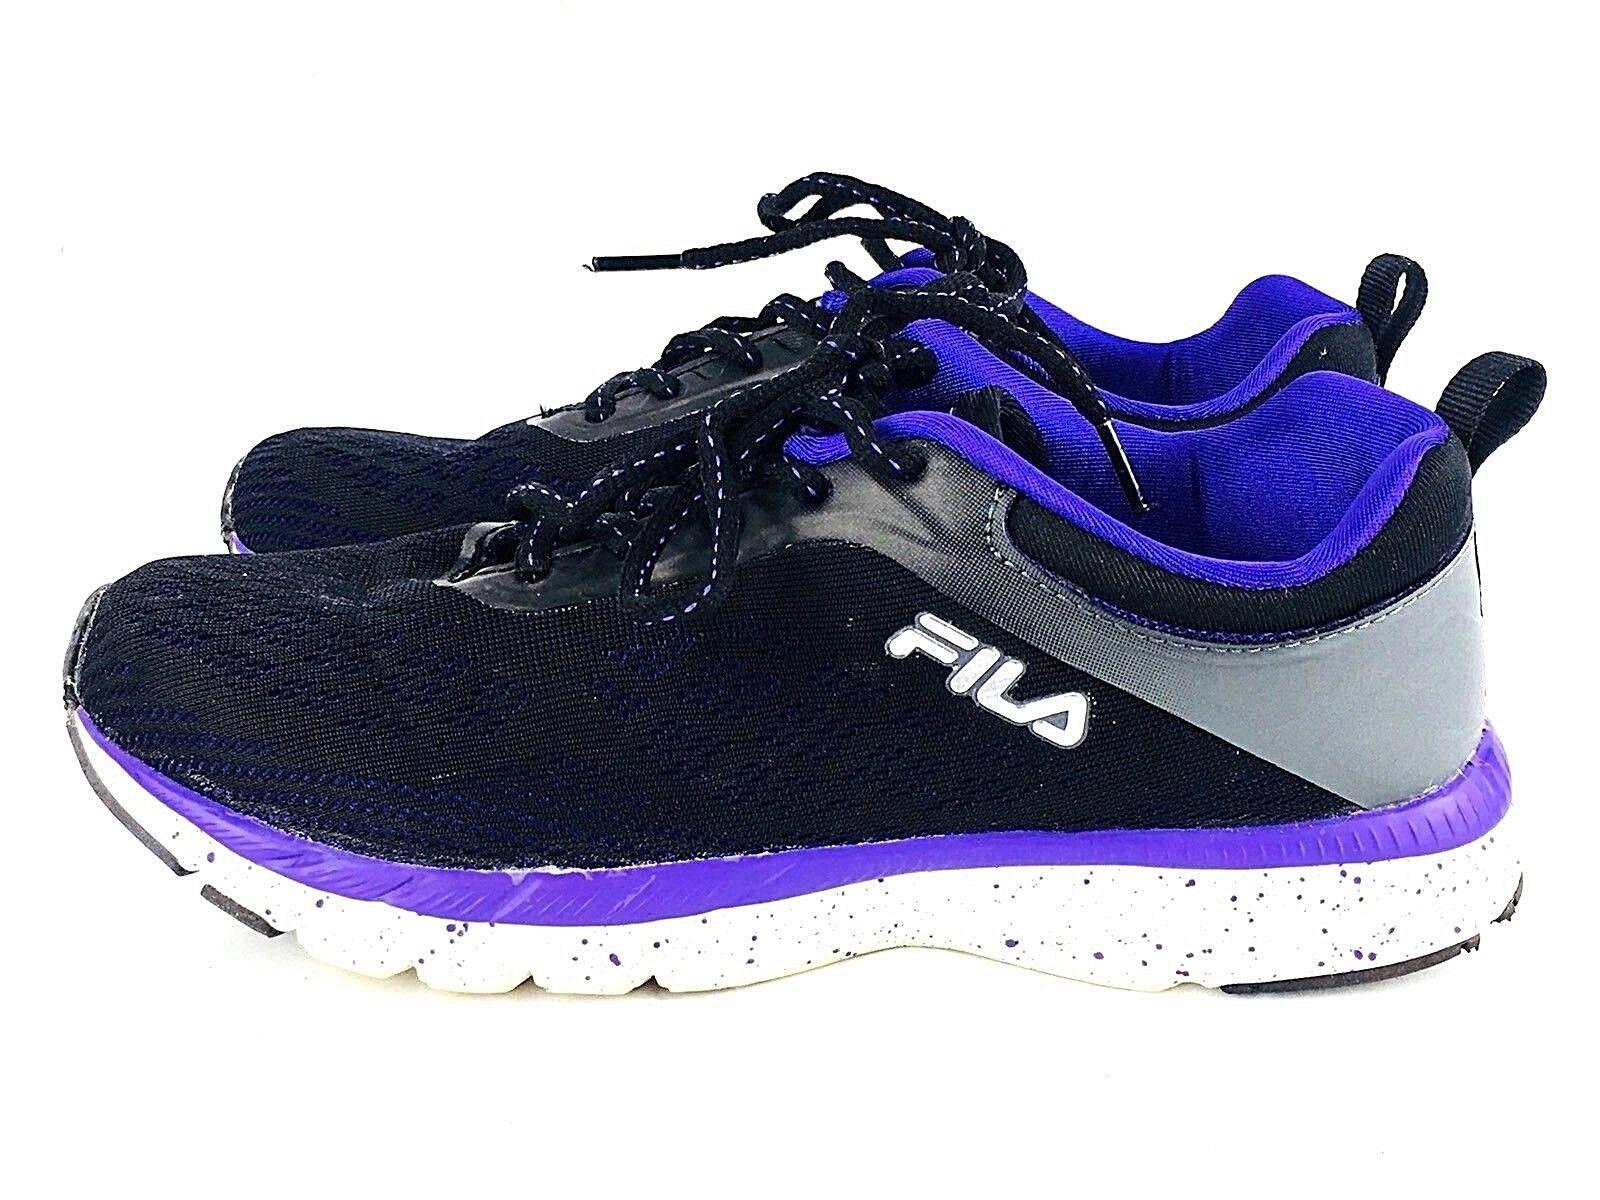 Fila Women's 7 Memory Outreach Foam Shoes Black Purple Athletic Price reduction Seasonal price cuts, discount benefits